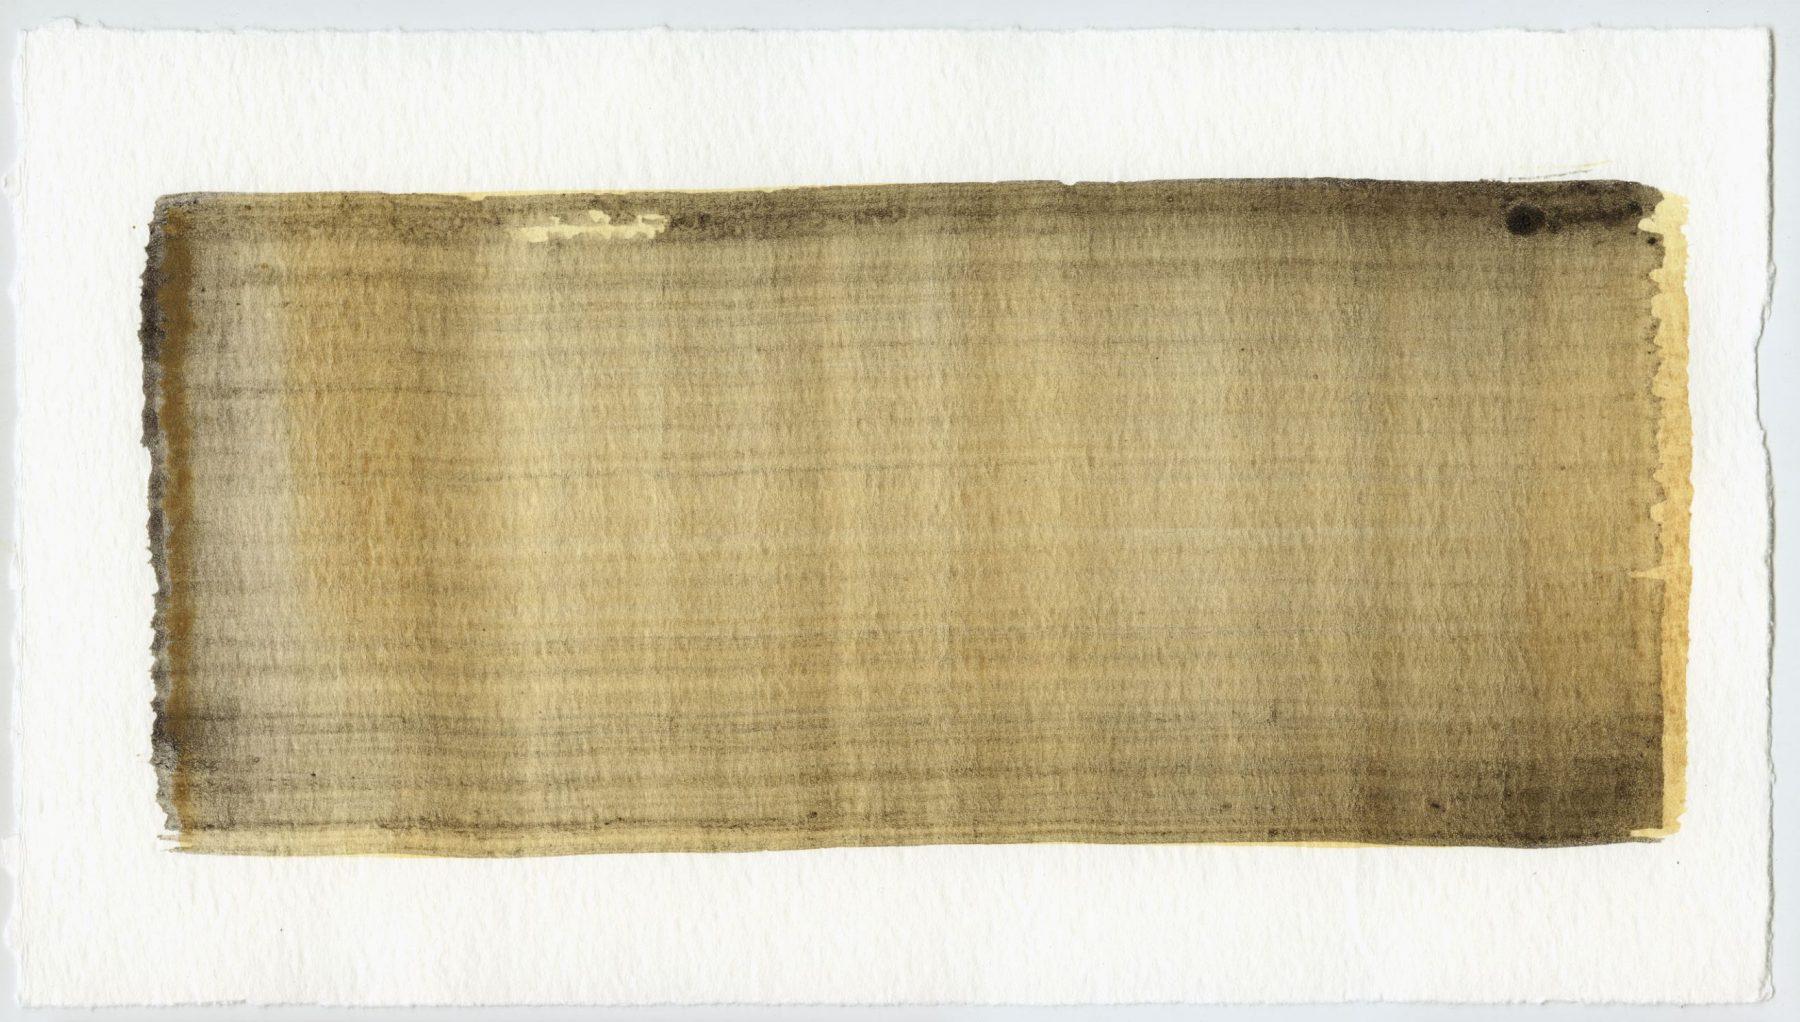 Brush stroke no. 29 - Selfmade pigment: IJzeroer, Slingerpad bruin